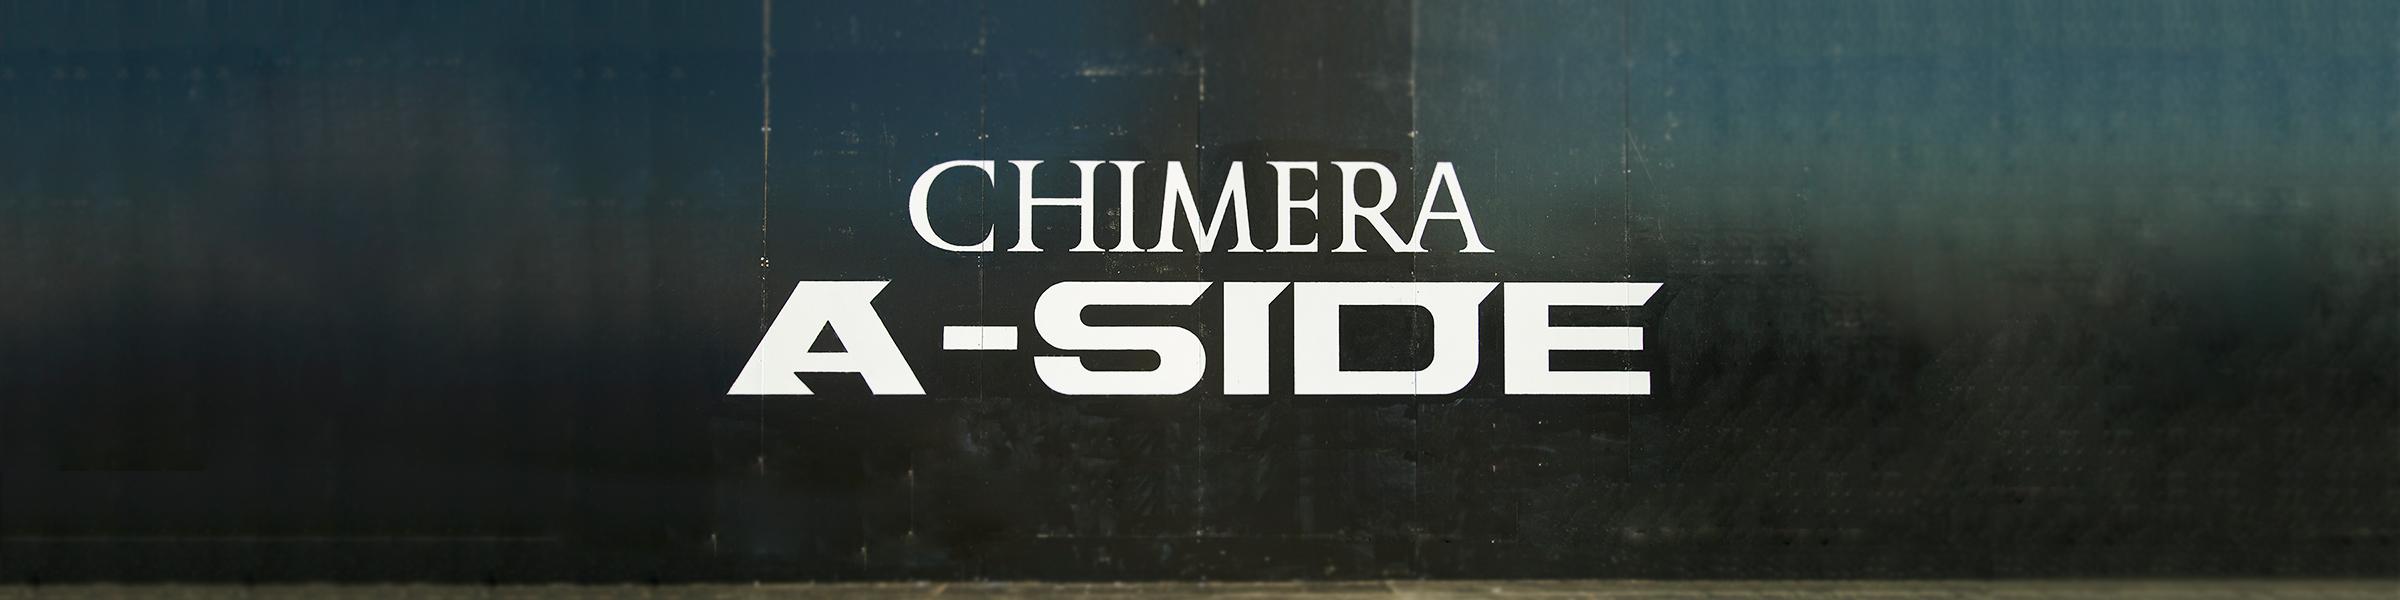 CHIMERA A-SIDEのTIMETABLEページ:カバービジュアル